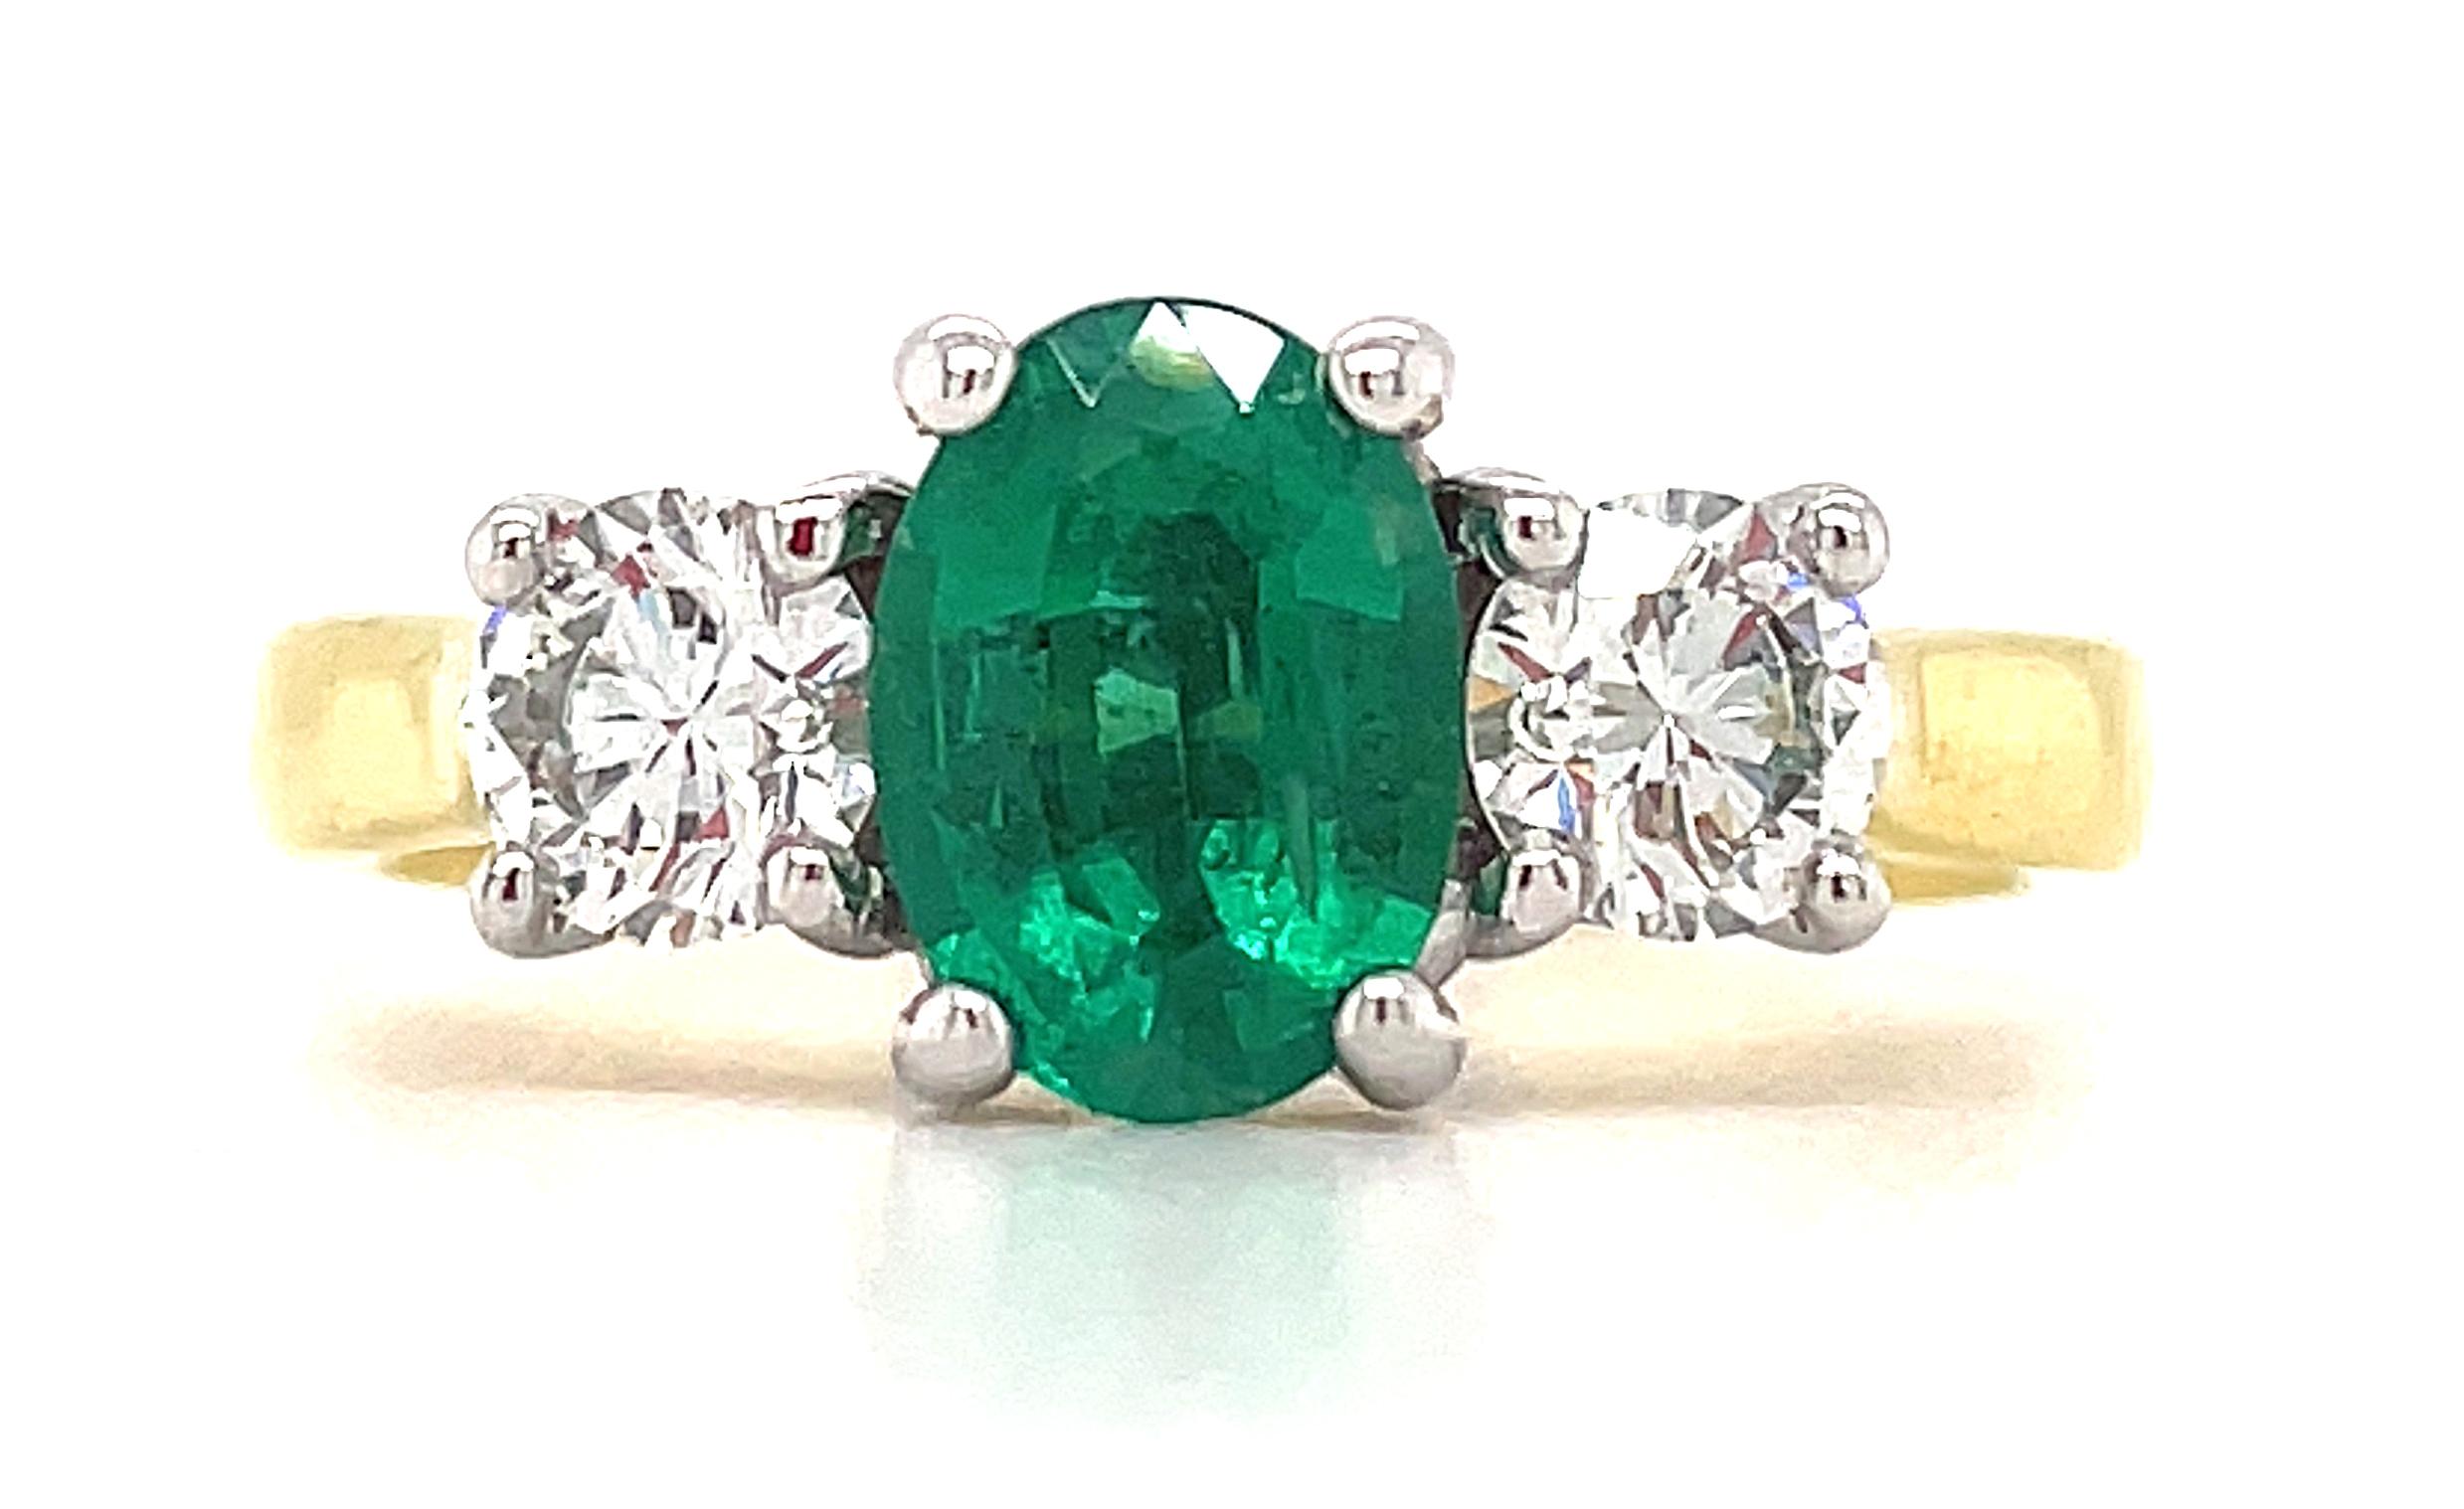 18k Yellow And White Gold 3 Stone Oval Emerald & Brilliant Cut Diamond Ring